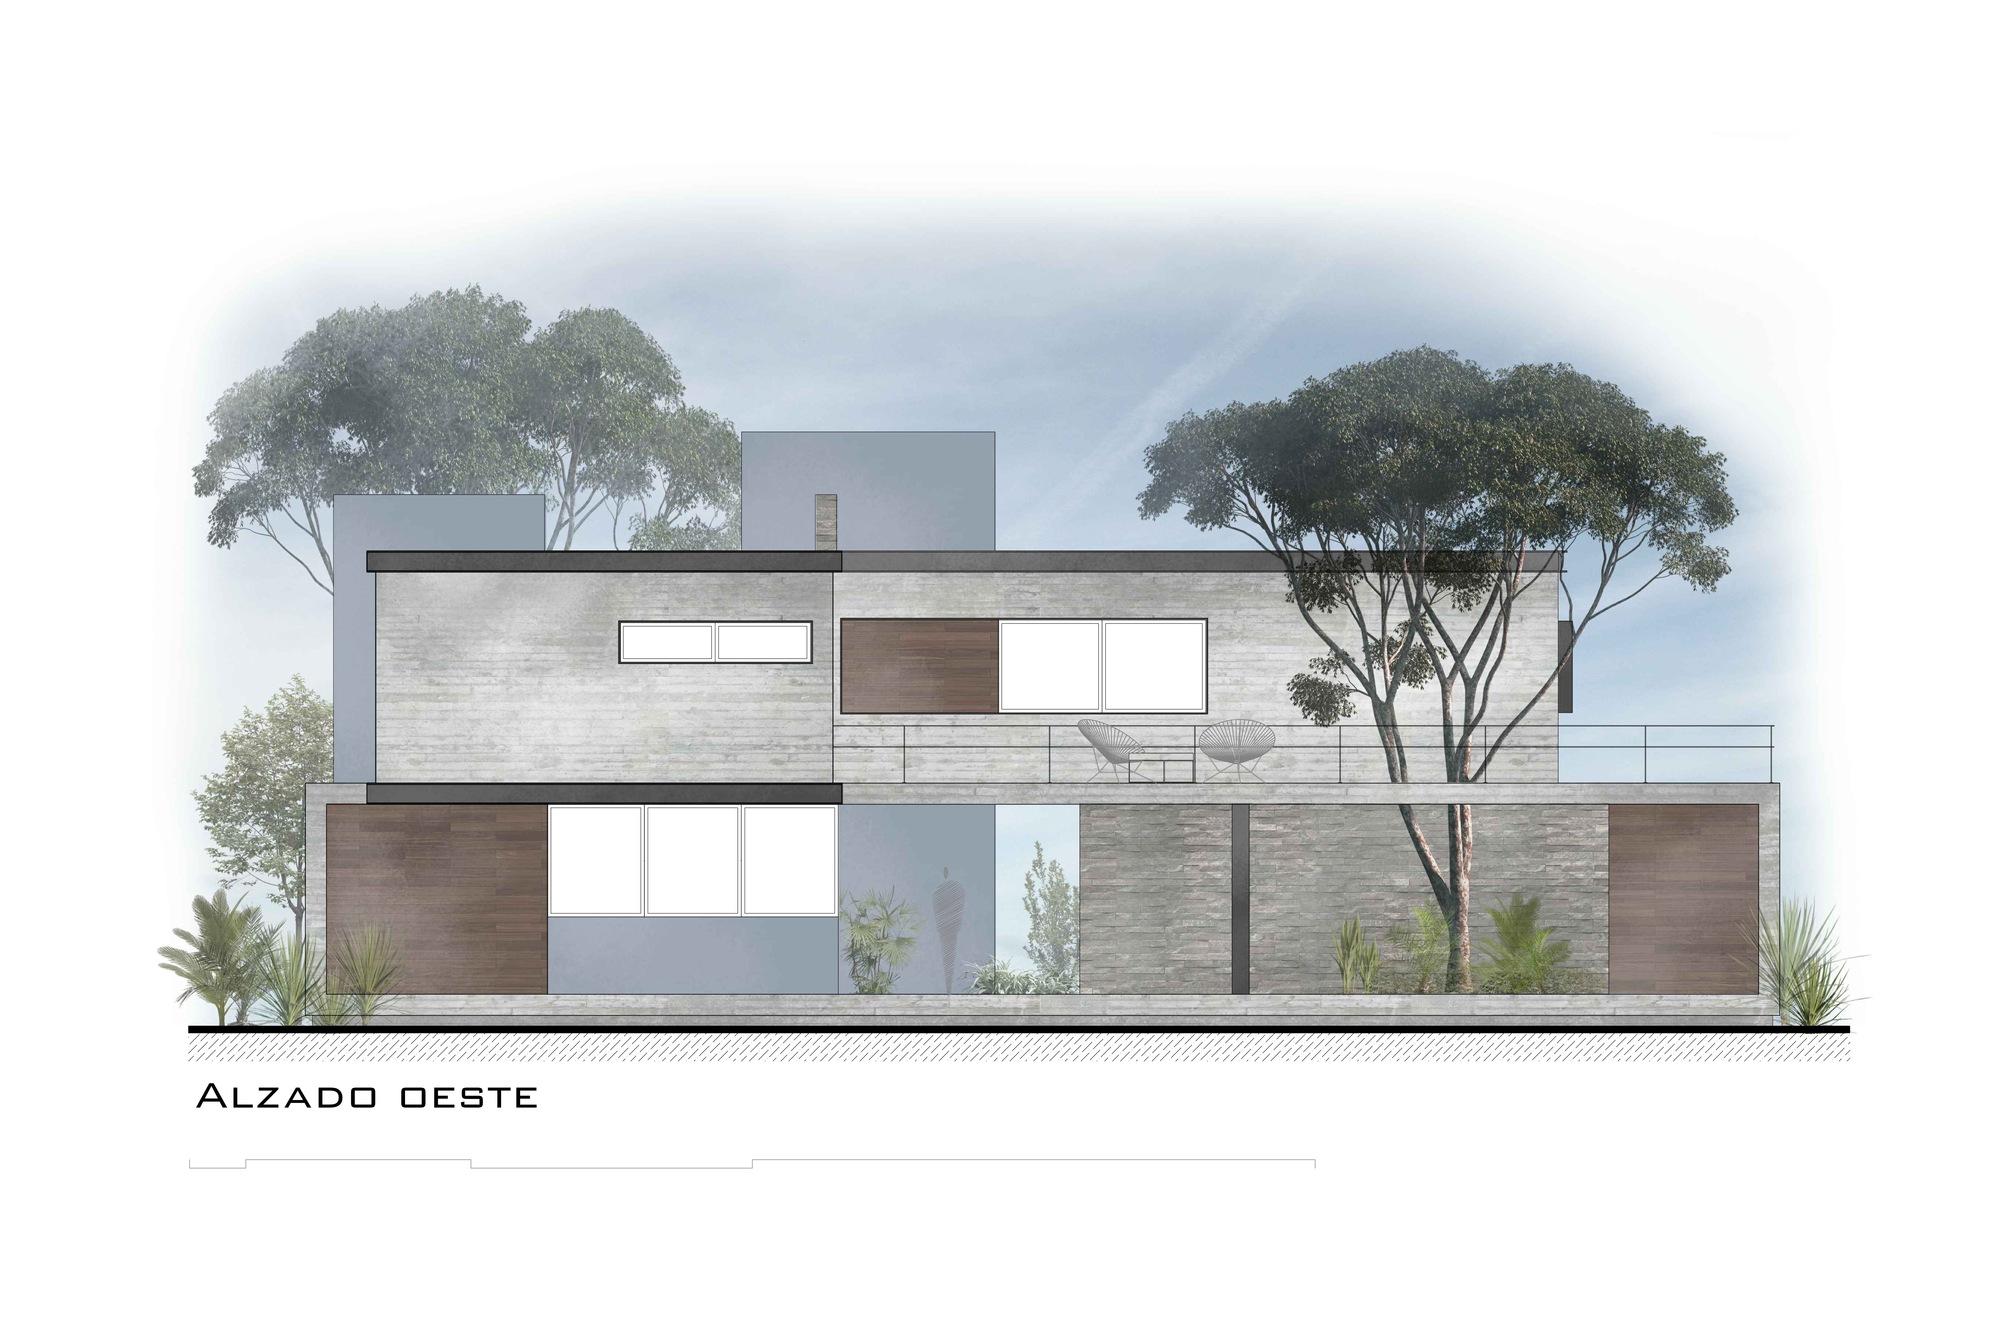 Galeria de casa kalyvas di frenna arquitectos 32 for Casa de arquitectos